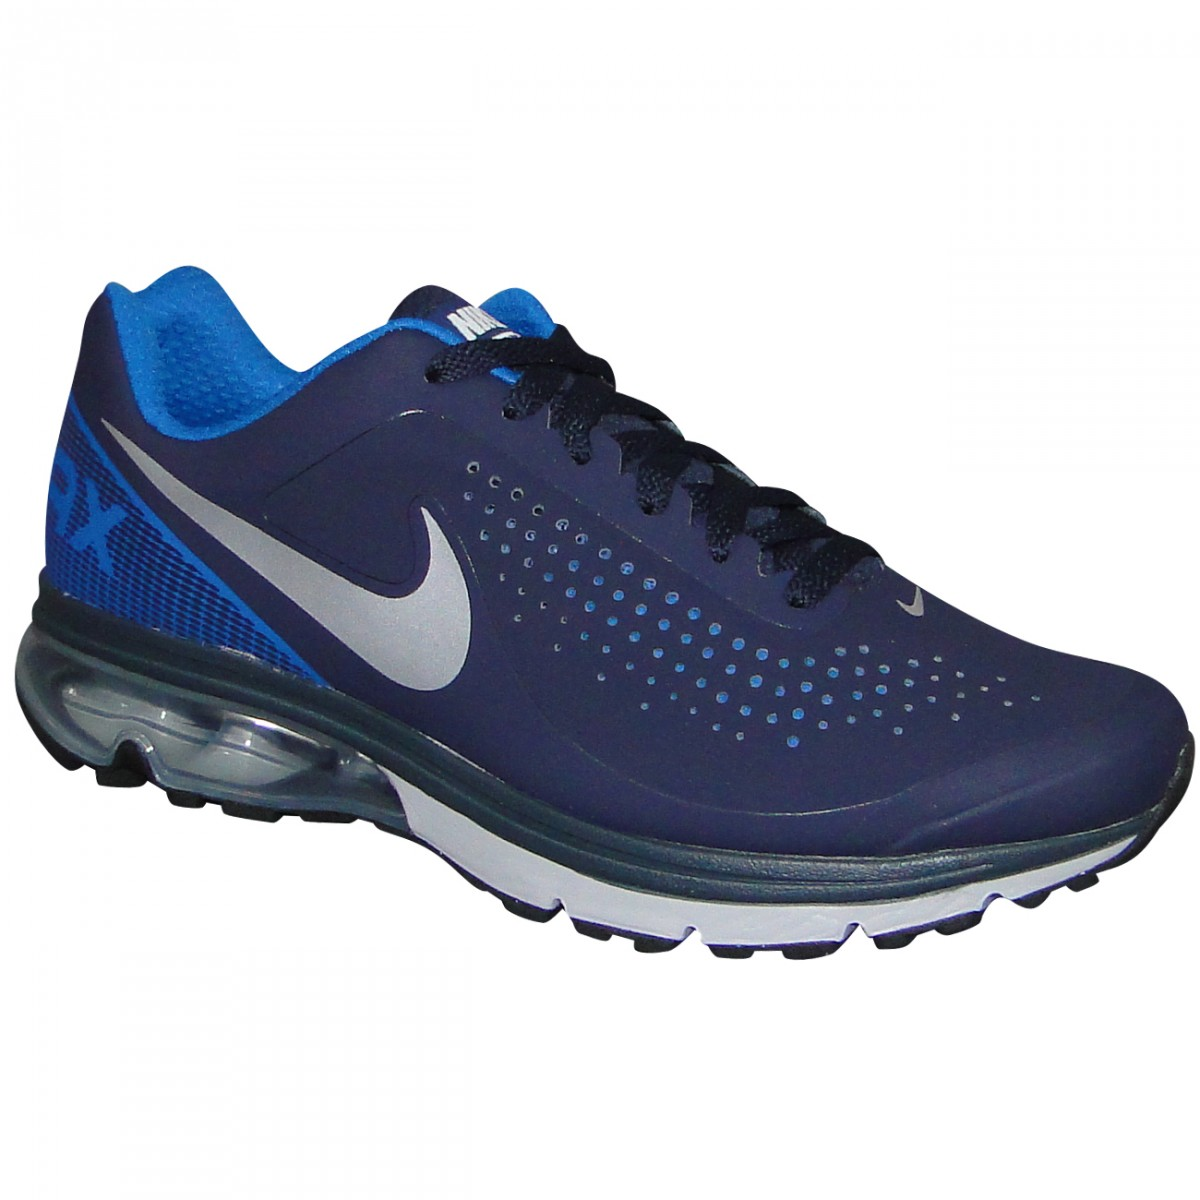 d92ba08b4e467 Tenis Nike Air Max Supreme 2 633024 420 - Marinho/Prata - Chuteira ...